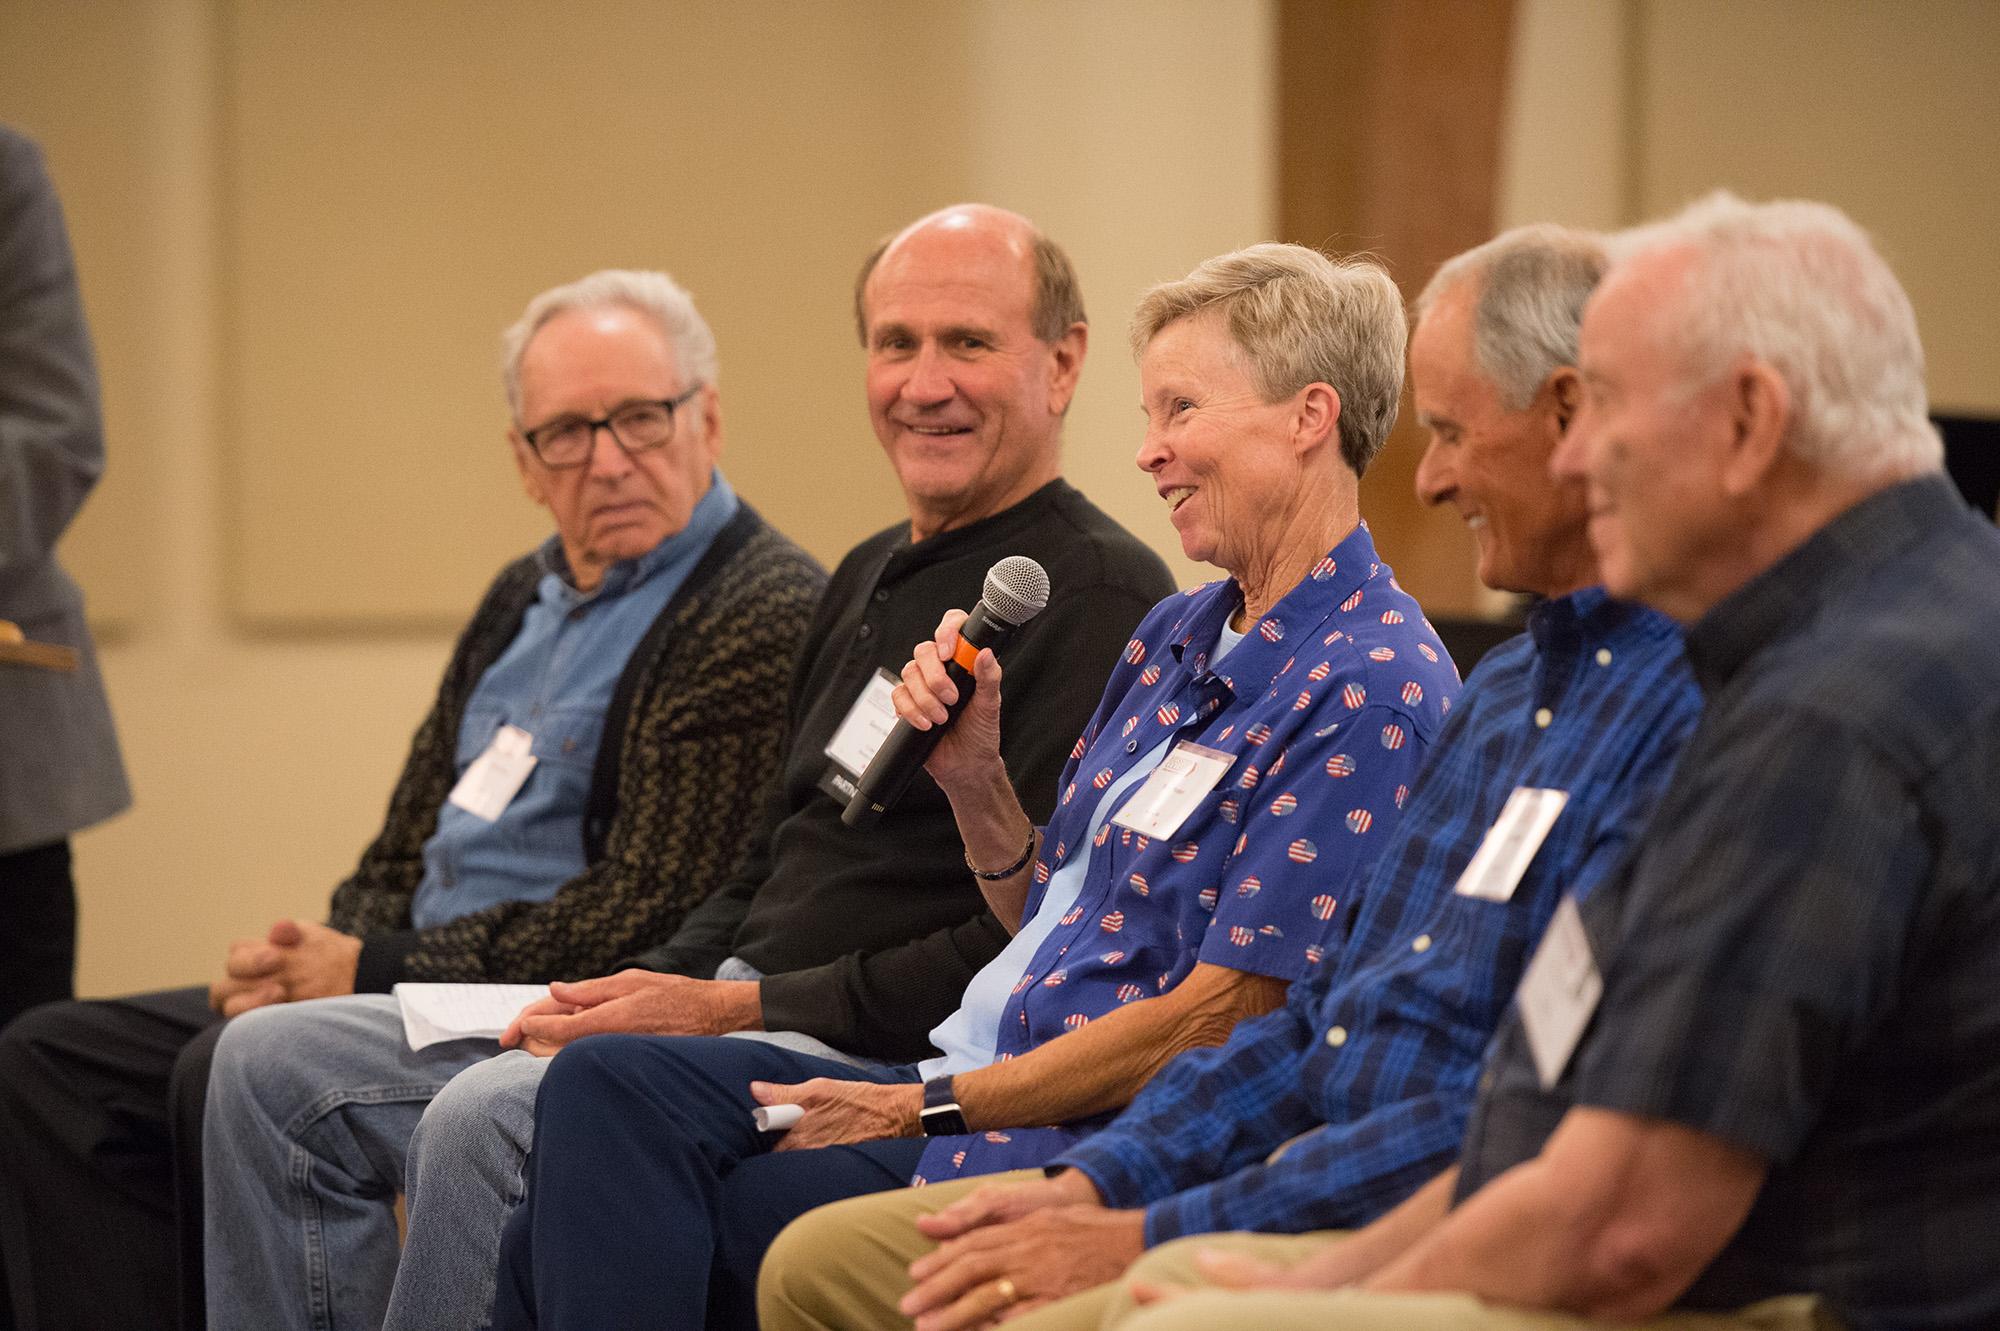 Former HC coaches Loren Reusser, Gerry Sieber, Vicki Mester, Art Mullet and Ken Hartzler share reflections on Lark athletics at the Golden Gables luncheon.